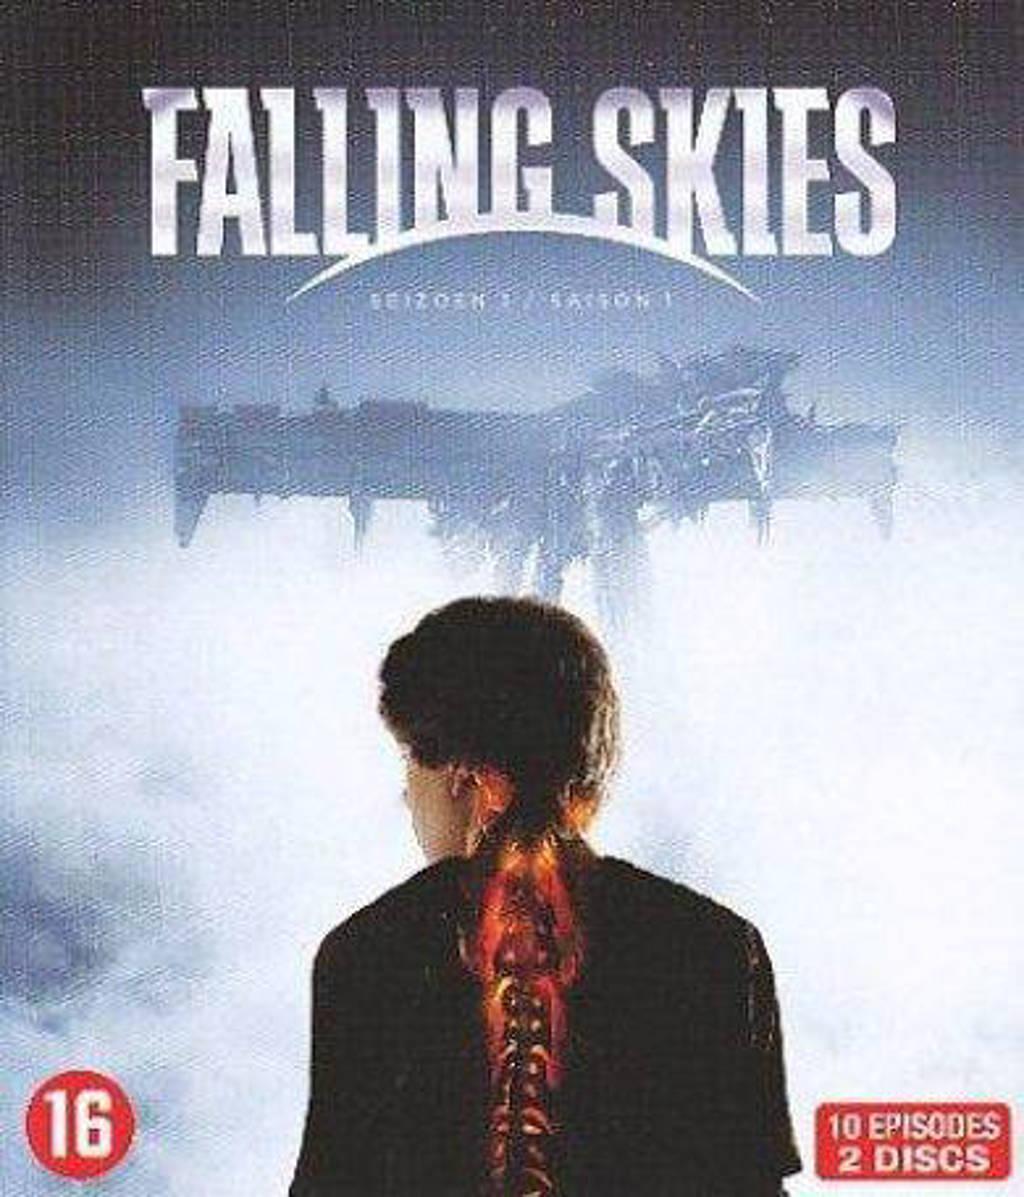 Falling skies - Seizoen 1 (Blu-ray)